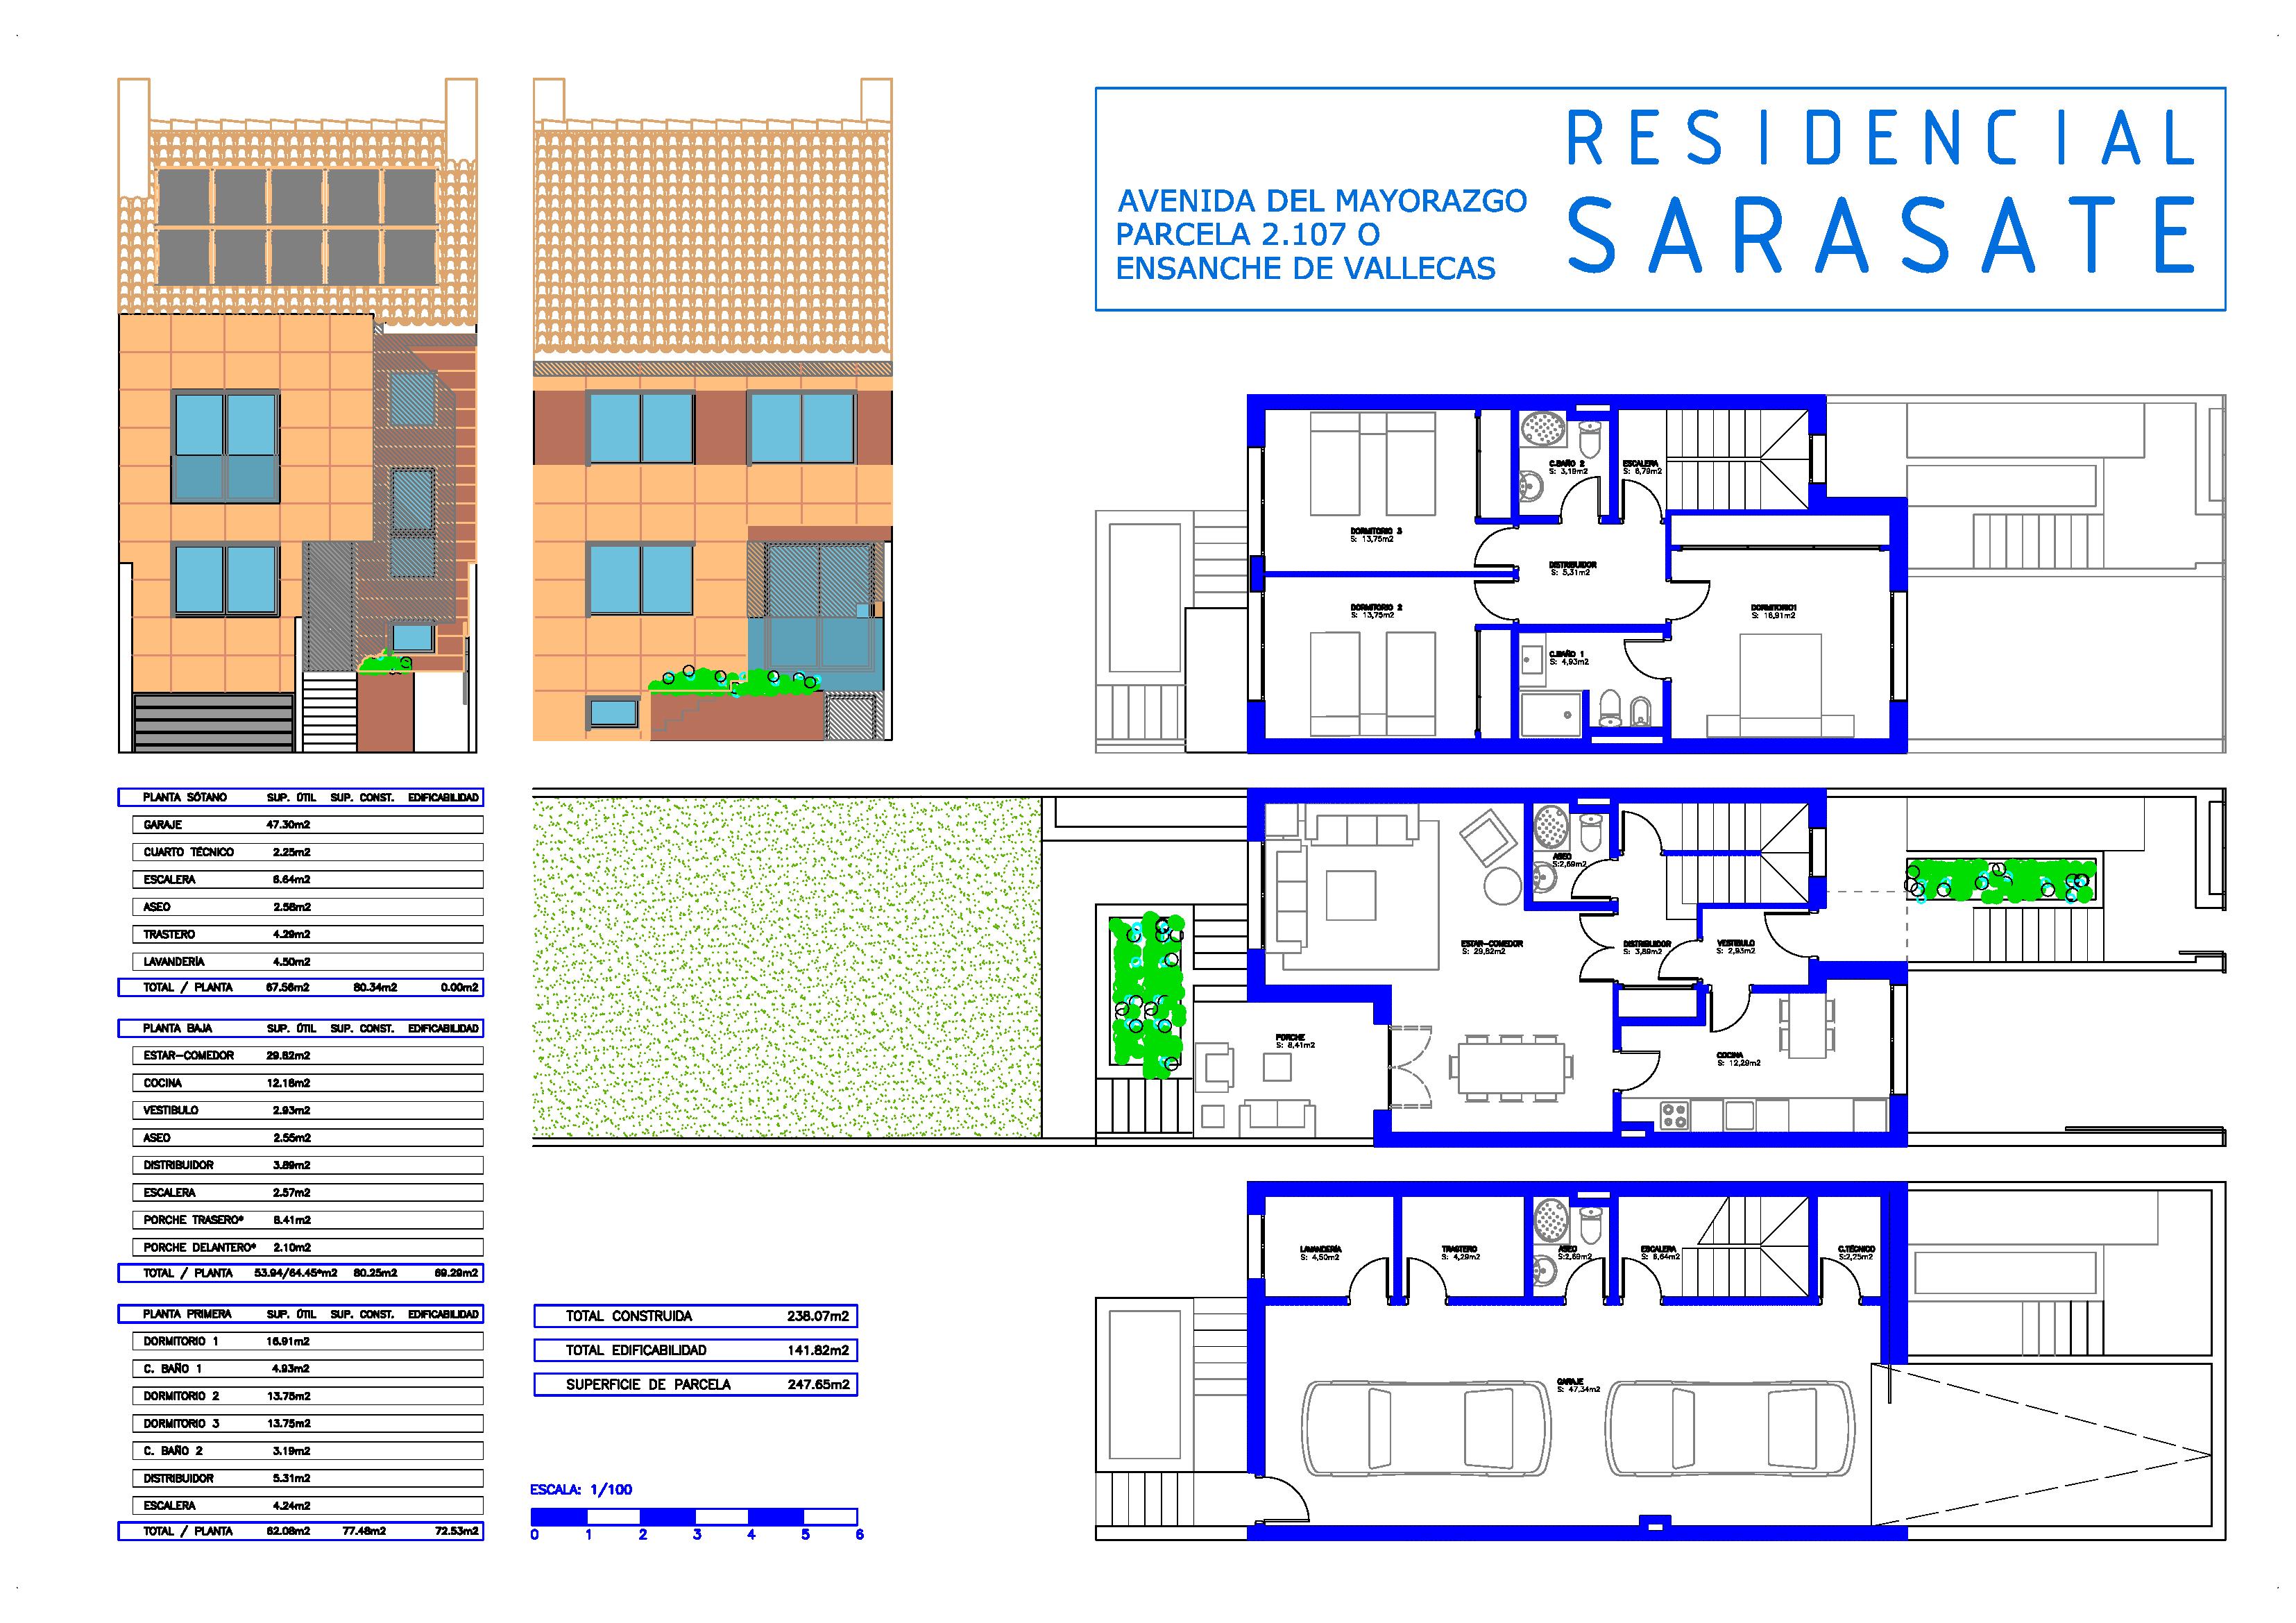 Residencial Sarasate